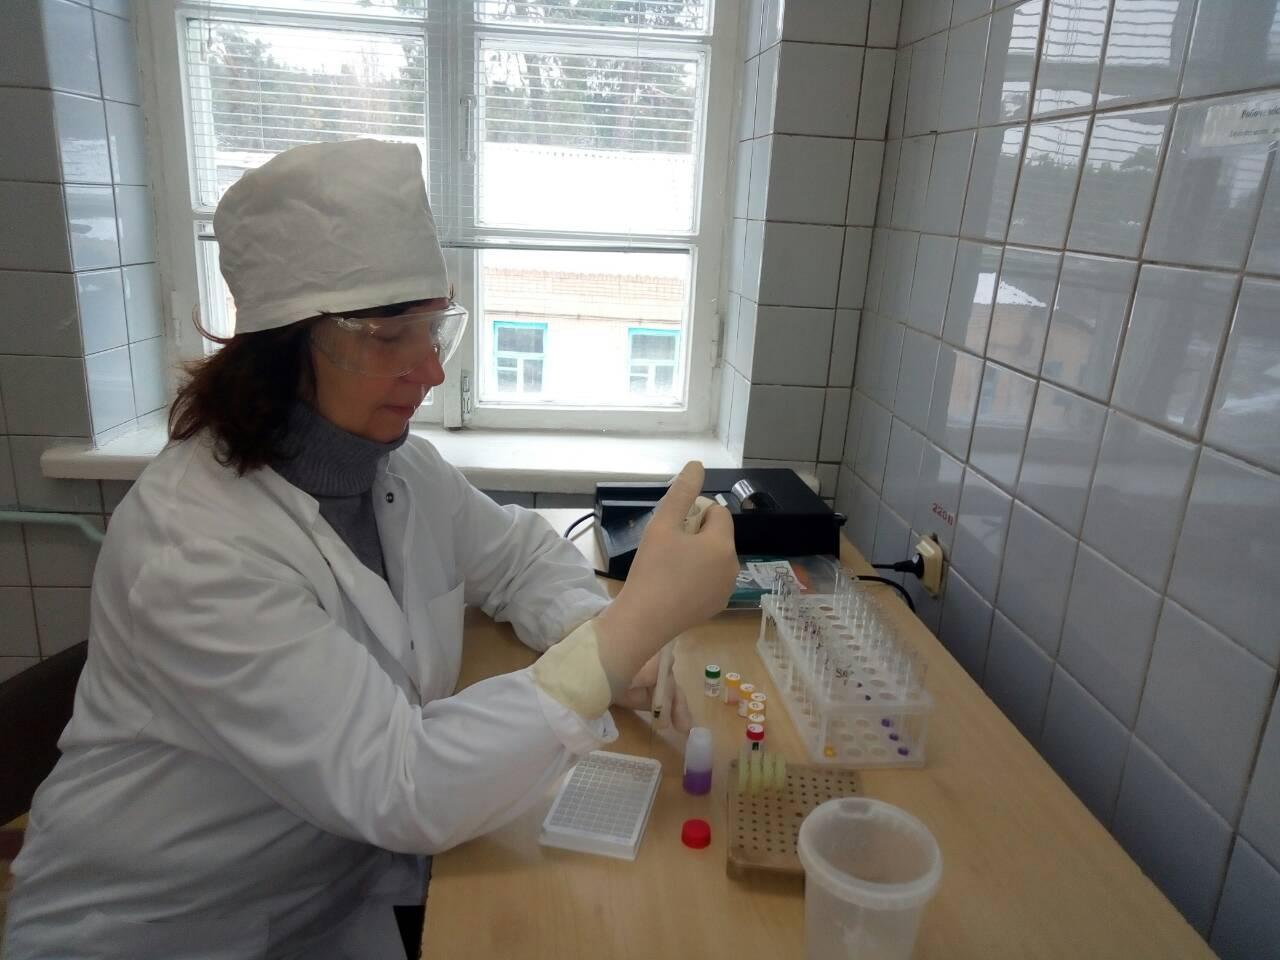 Лахненко Оксана Юріївна лікар-лаборант в.кв.кат.т